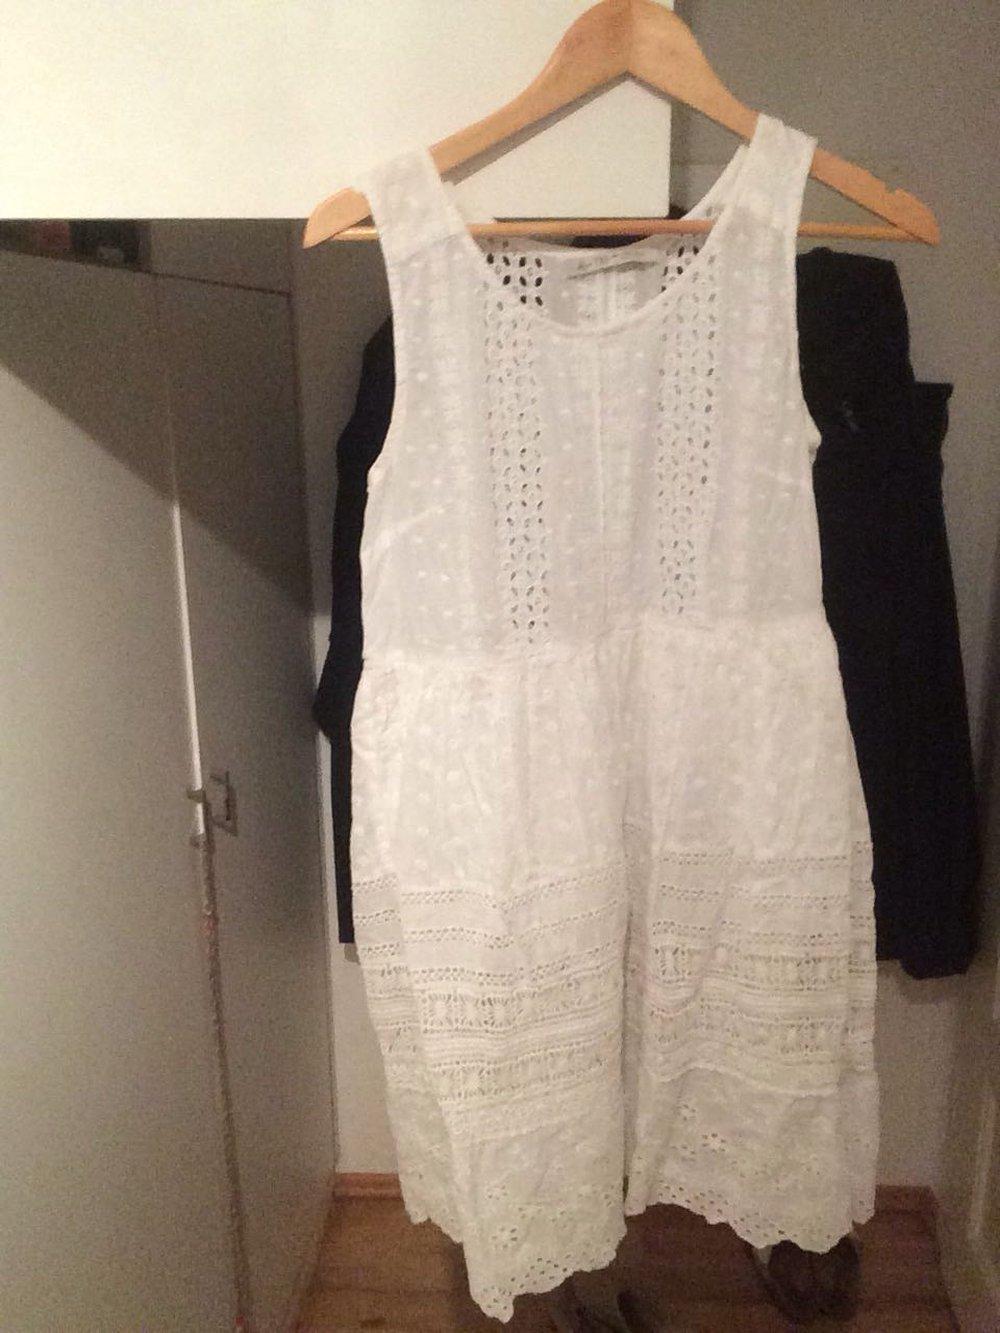 free shipping 8c147 2ed68 Spitze Weißes Sommerkleid Sommerkleid Zara Zara Zara Weißes ...